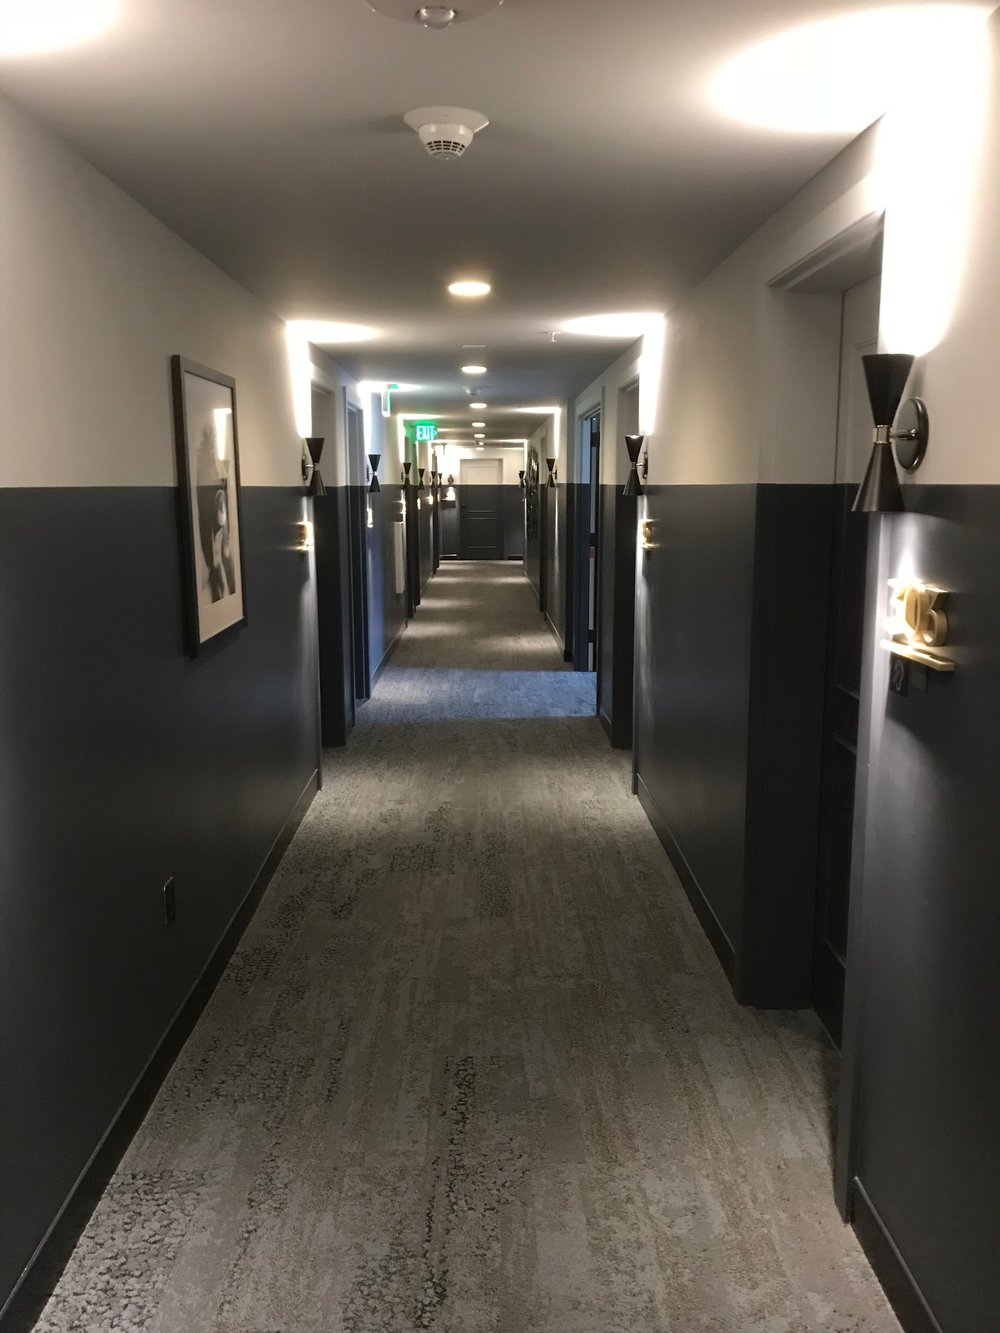 Hallway leading to the elevator